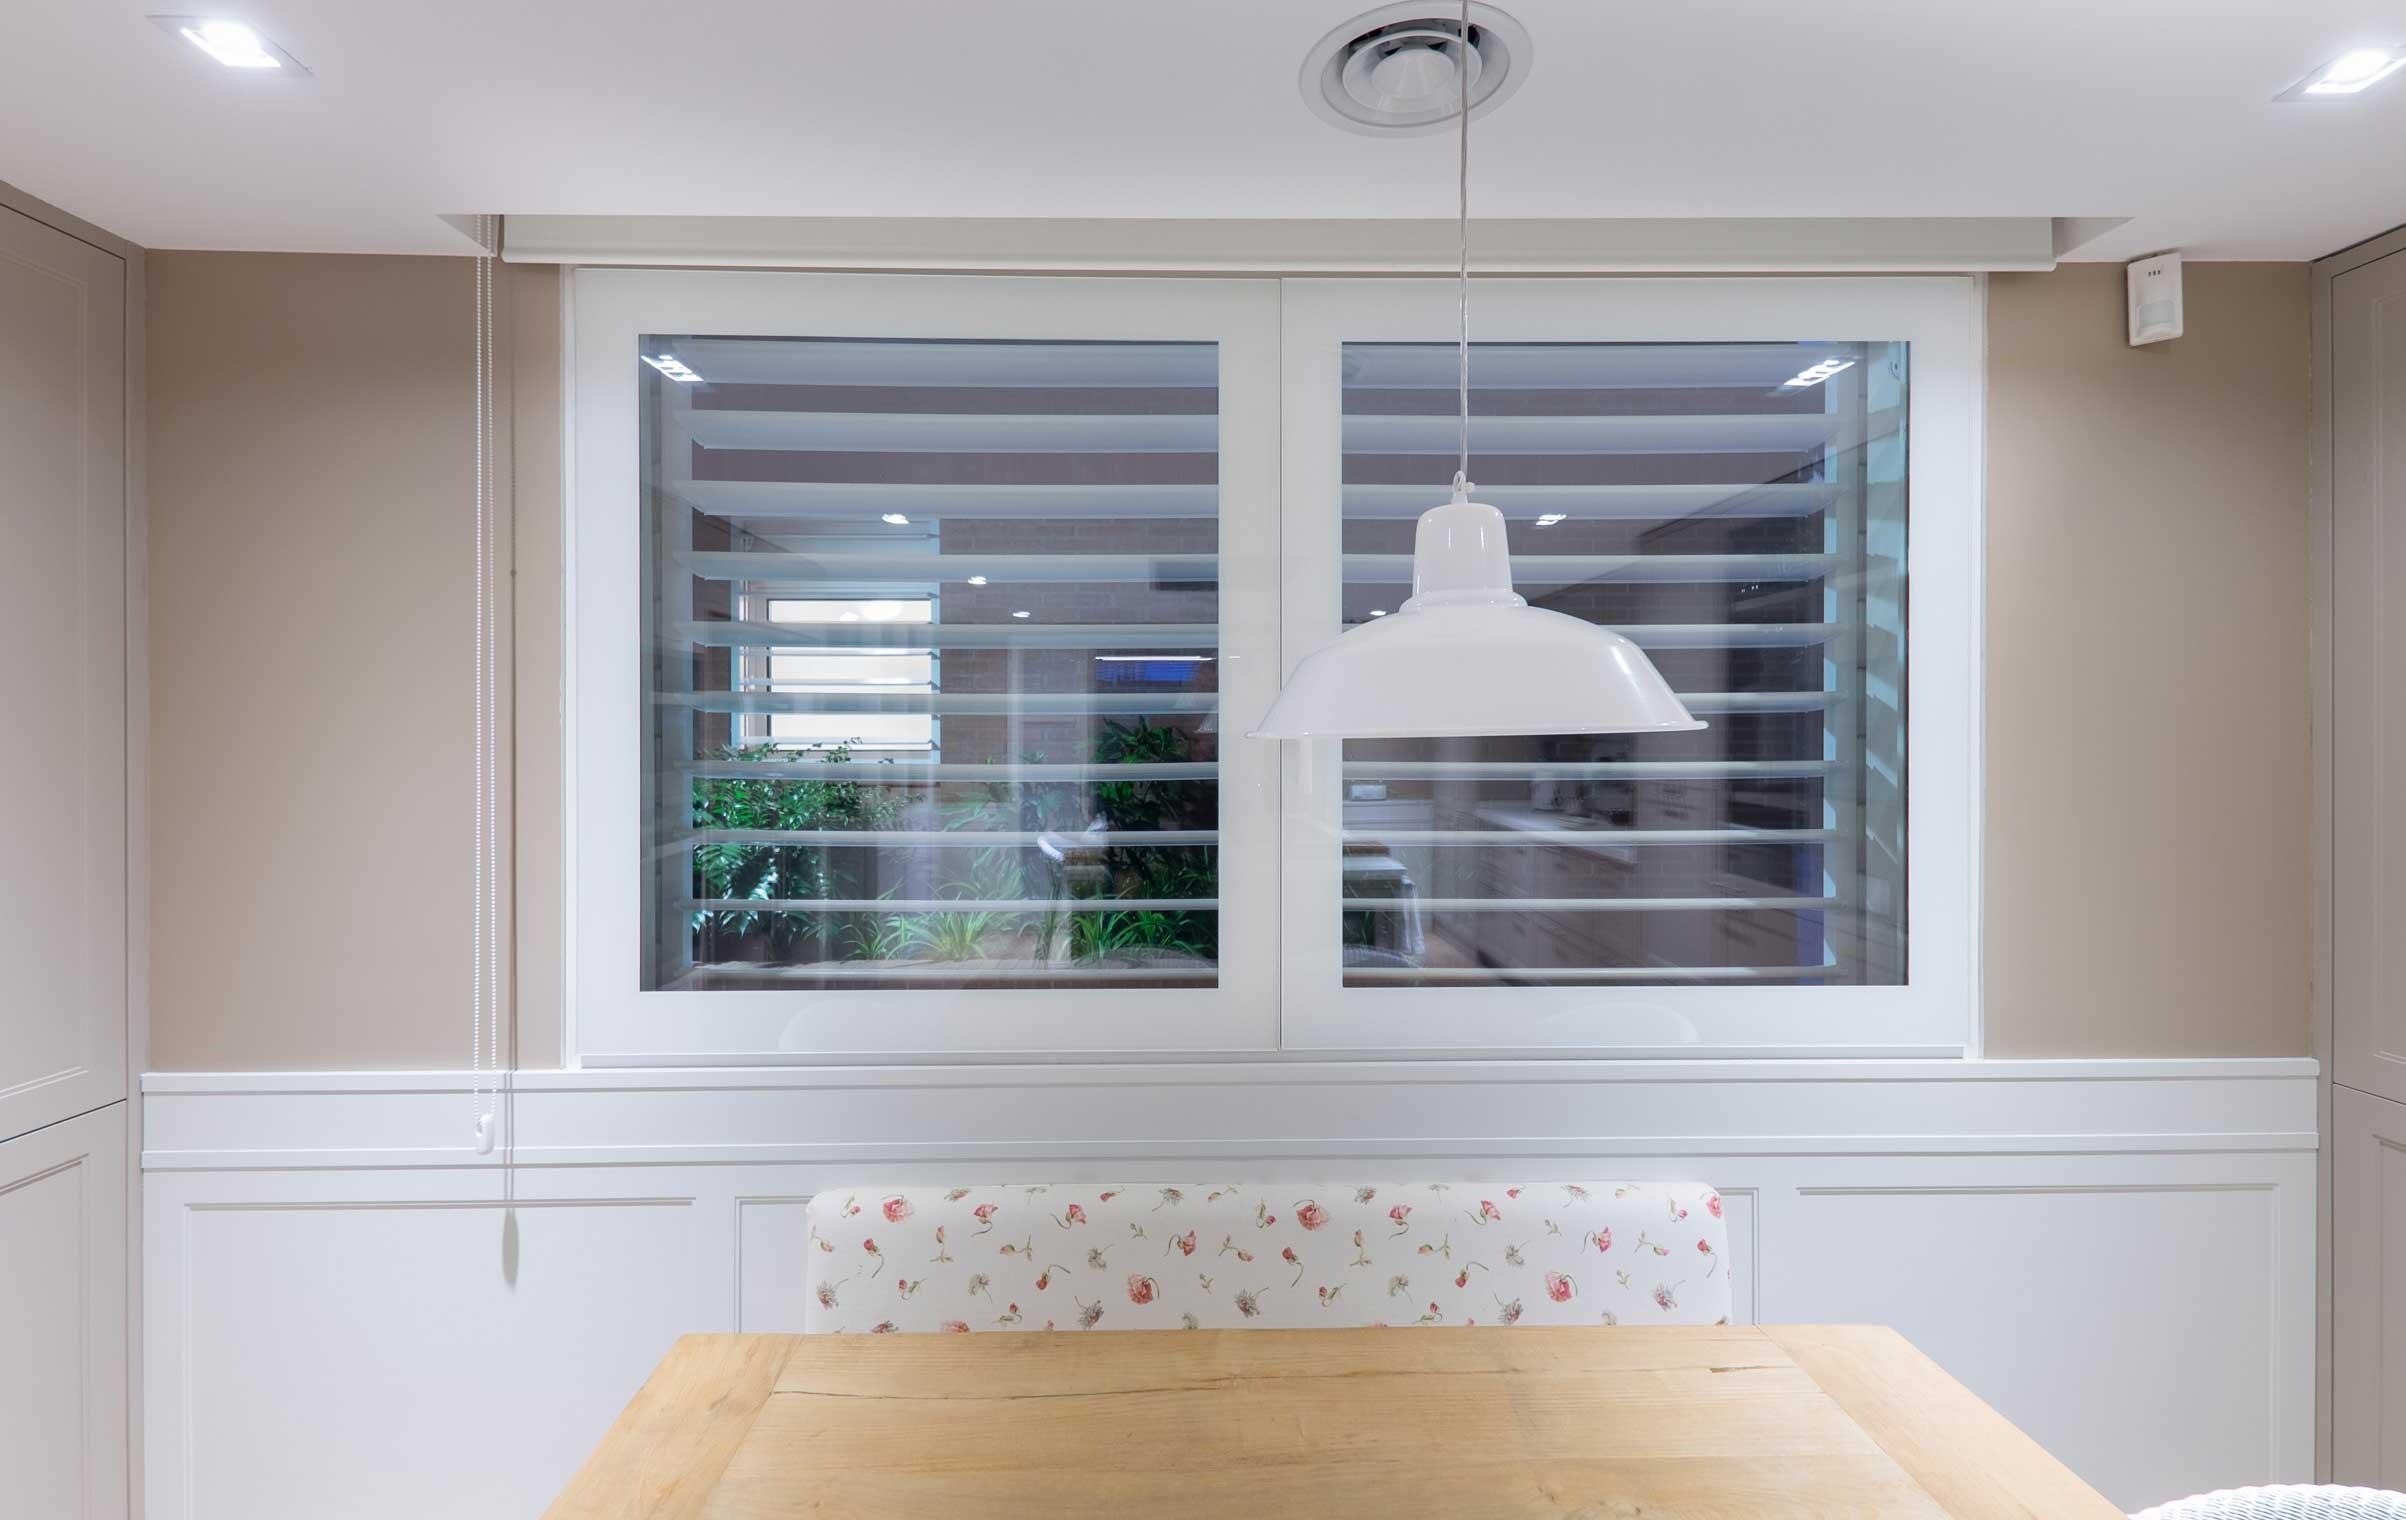 VITRAWINDOW_ventana-sin-perfiles_-ventana-sin-marco-ventana-minimalista-arquitectura-minimalista-casa-minimalista-creawindows4